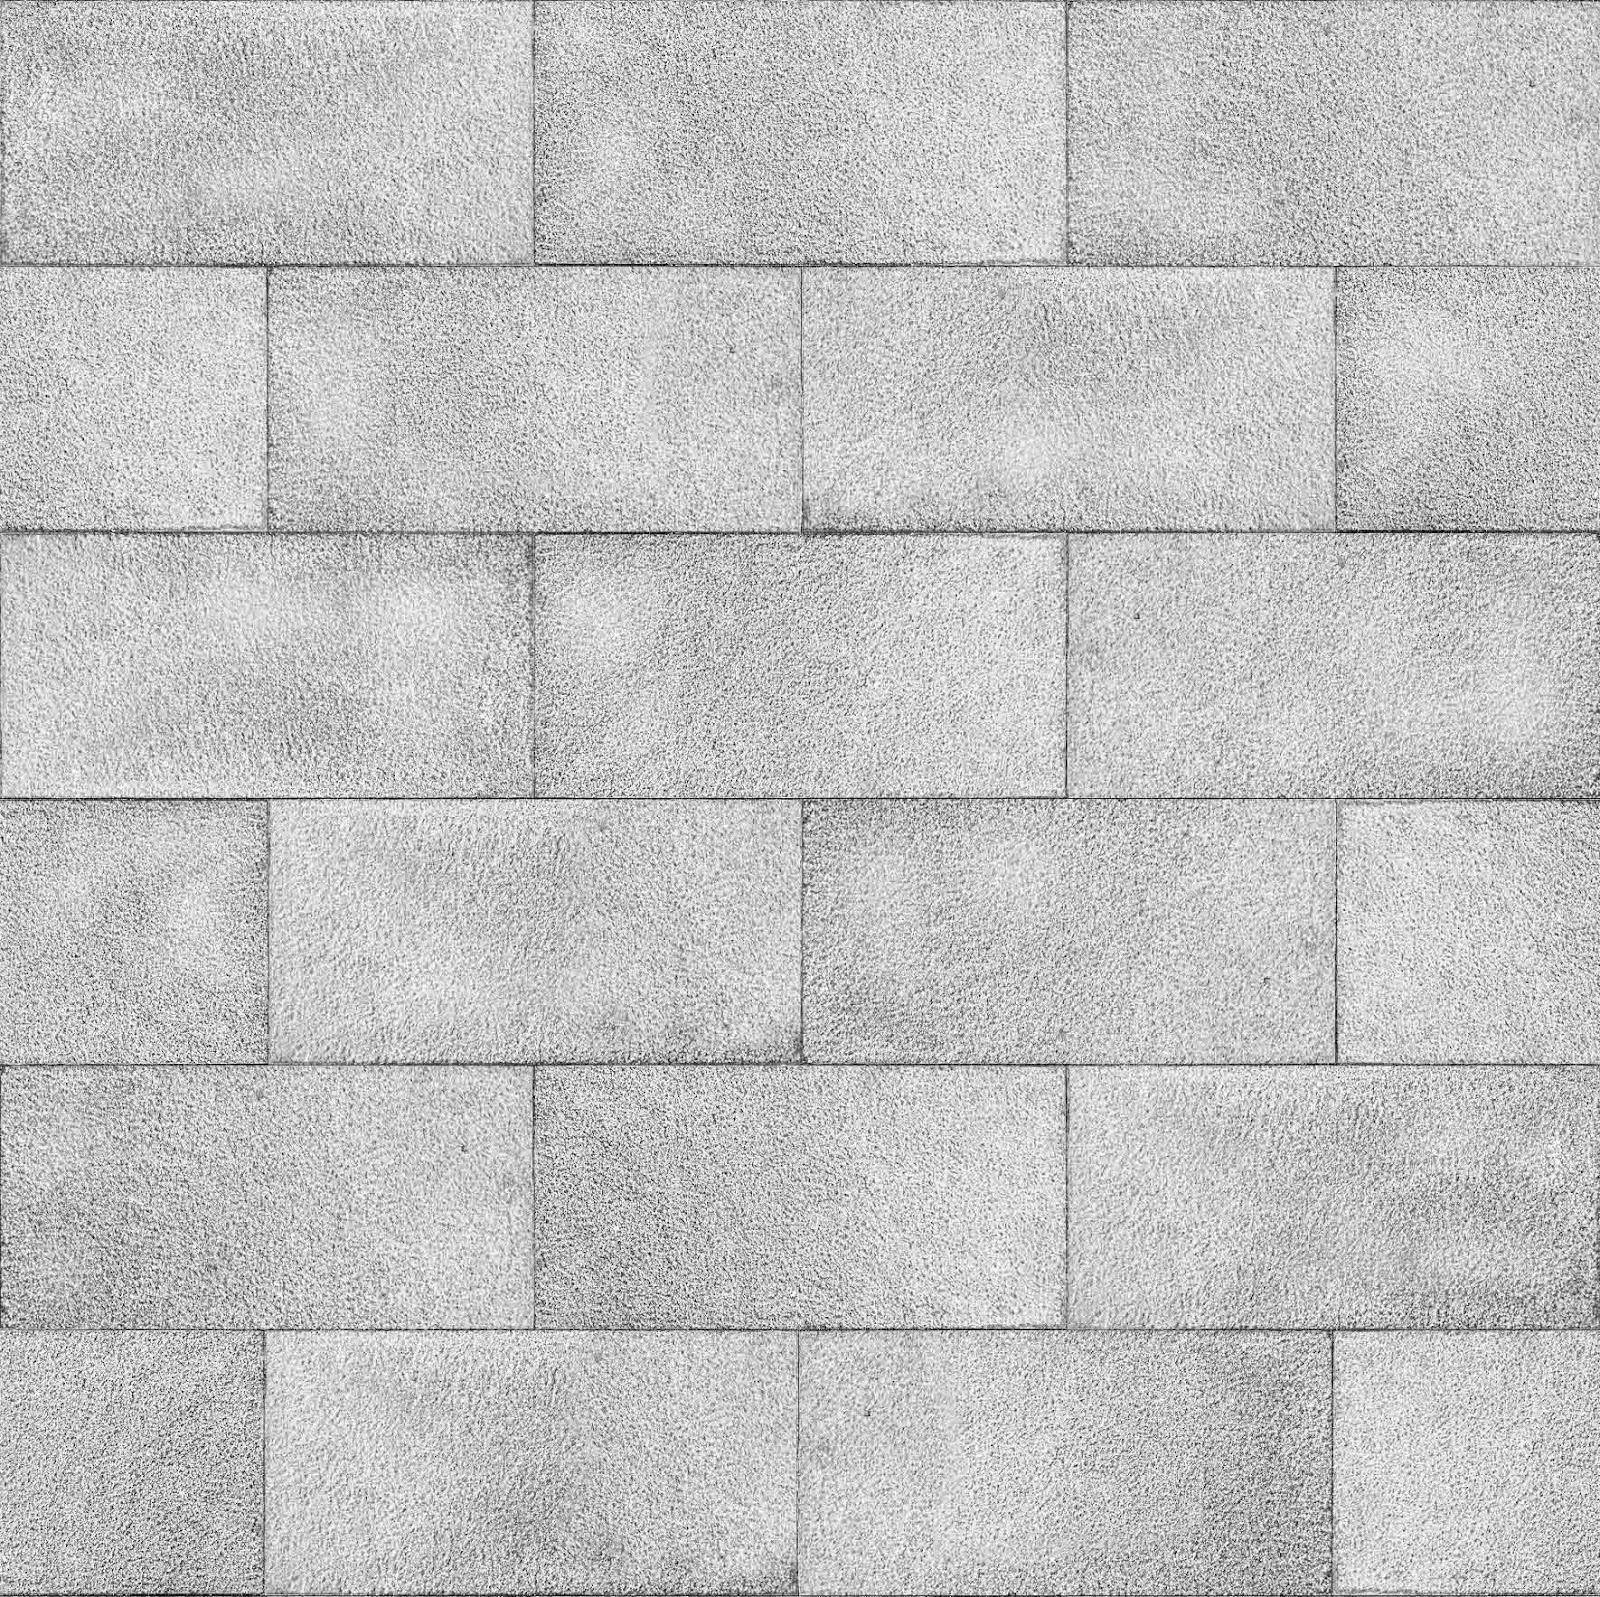 simo texture seamless pavimento basalto